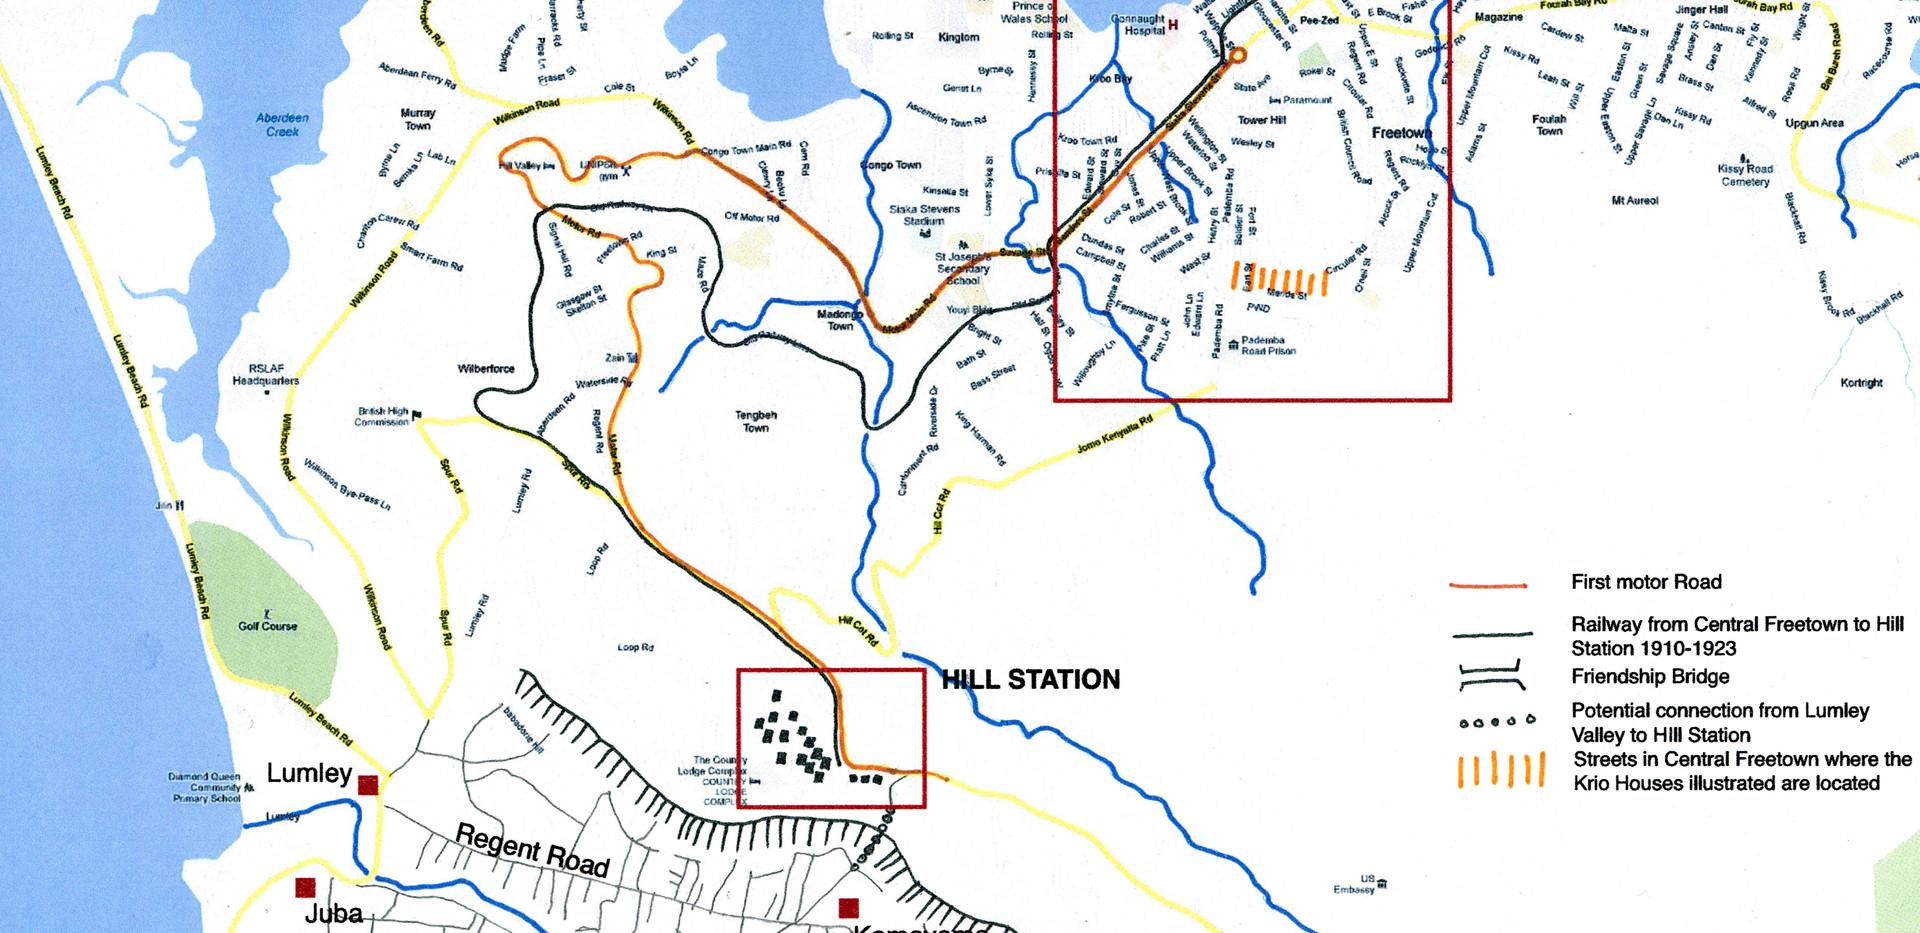 Map of Freetown & Lumley